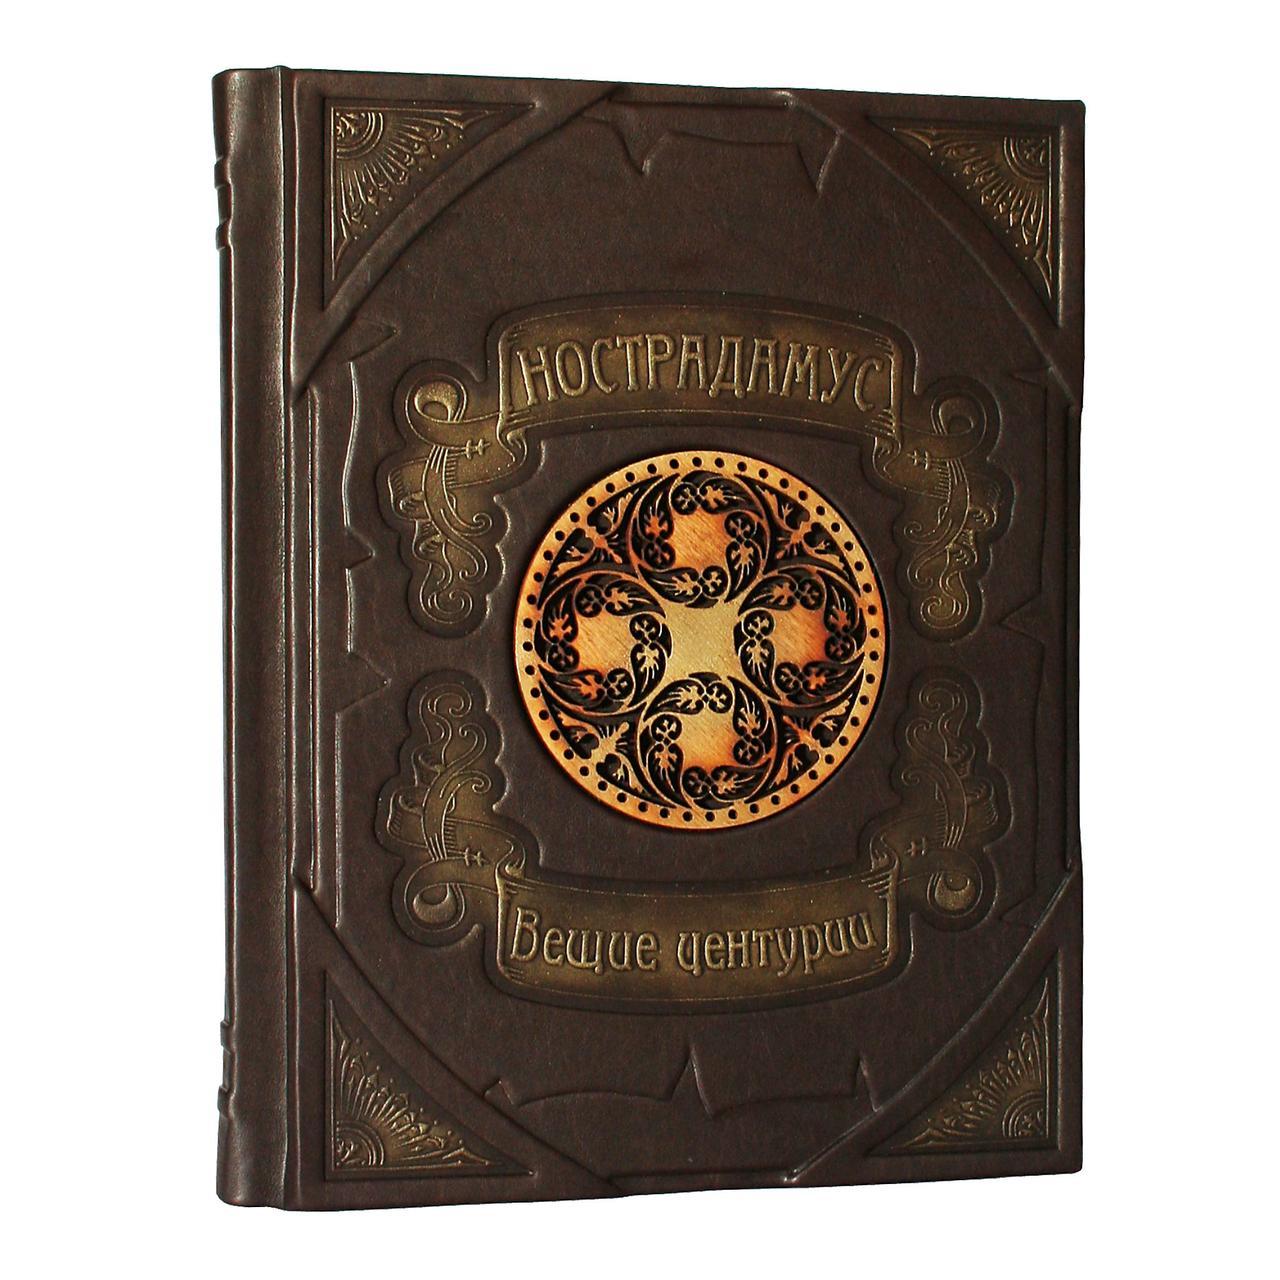 "Книга ""Нострадамус"". Вещие центурии"